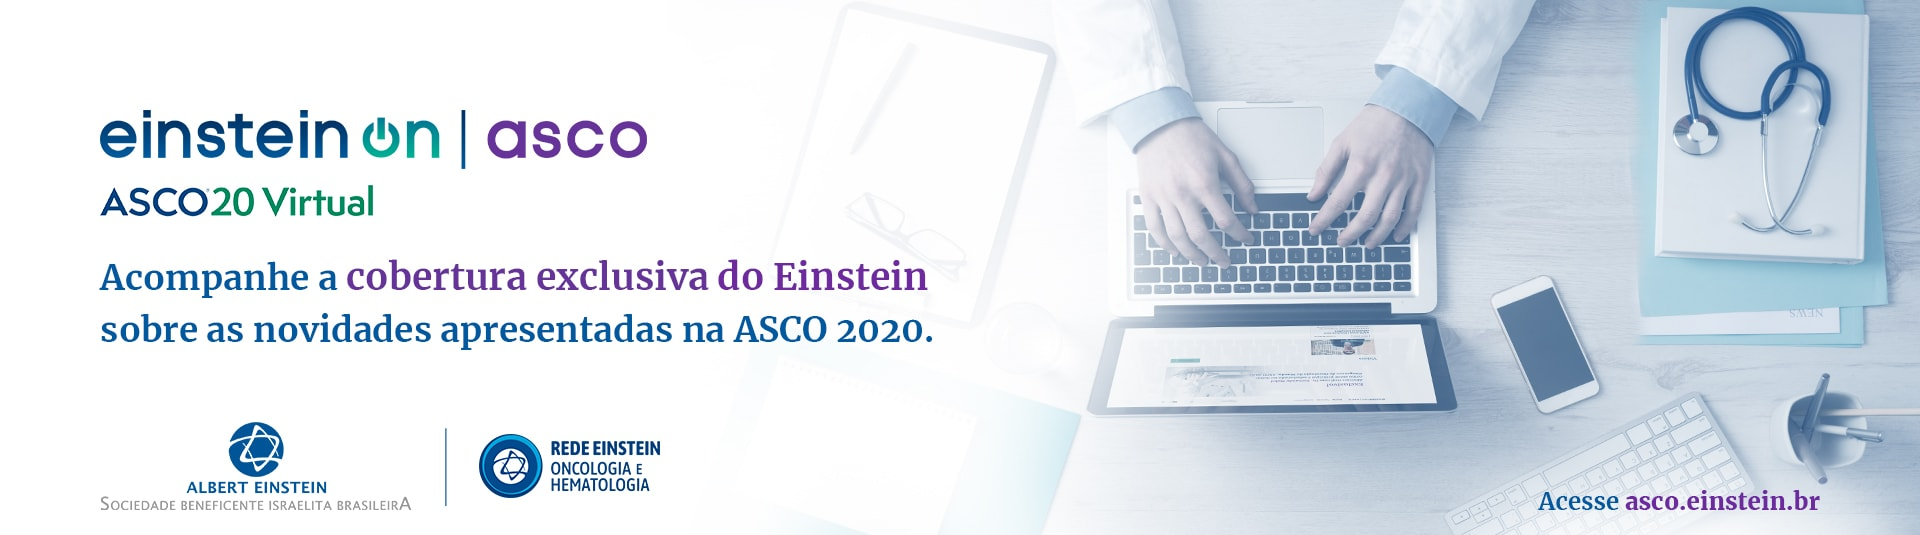 asco-BANNER-SBC-min